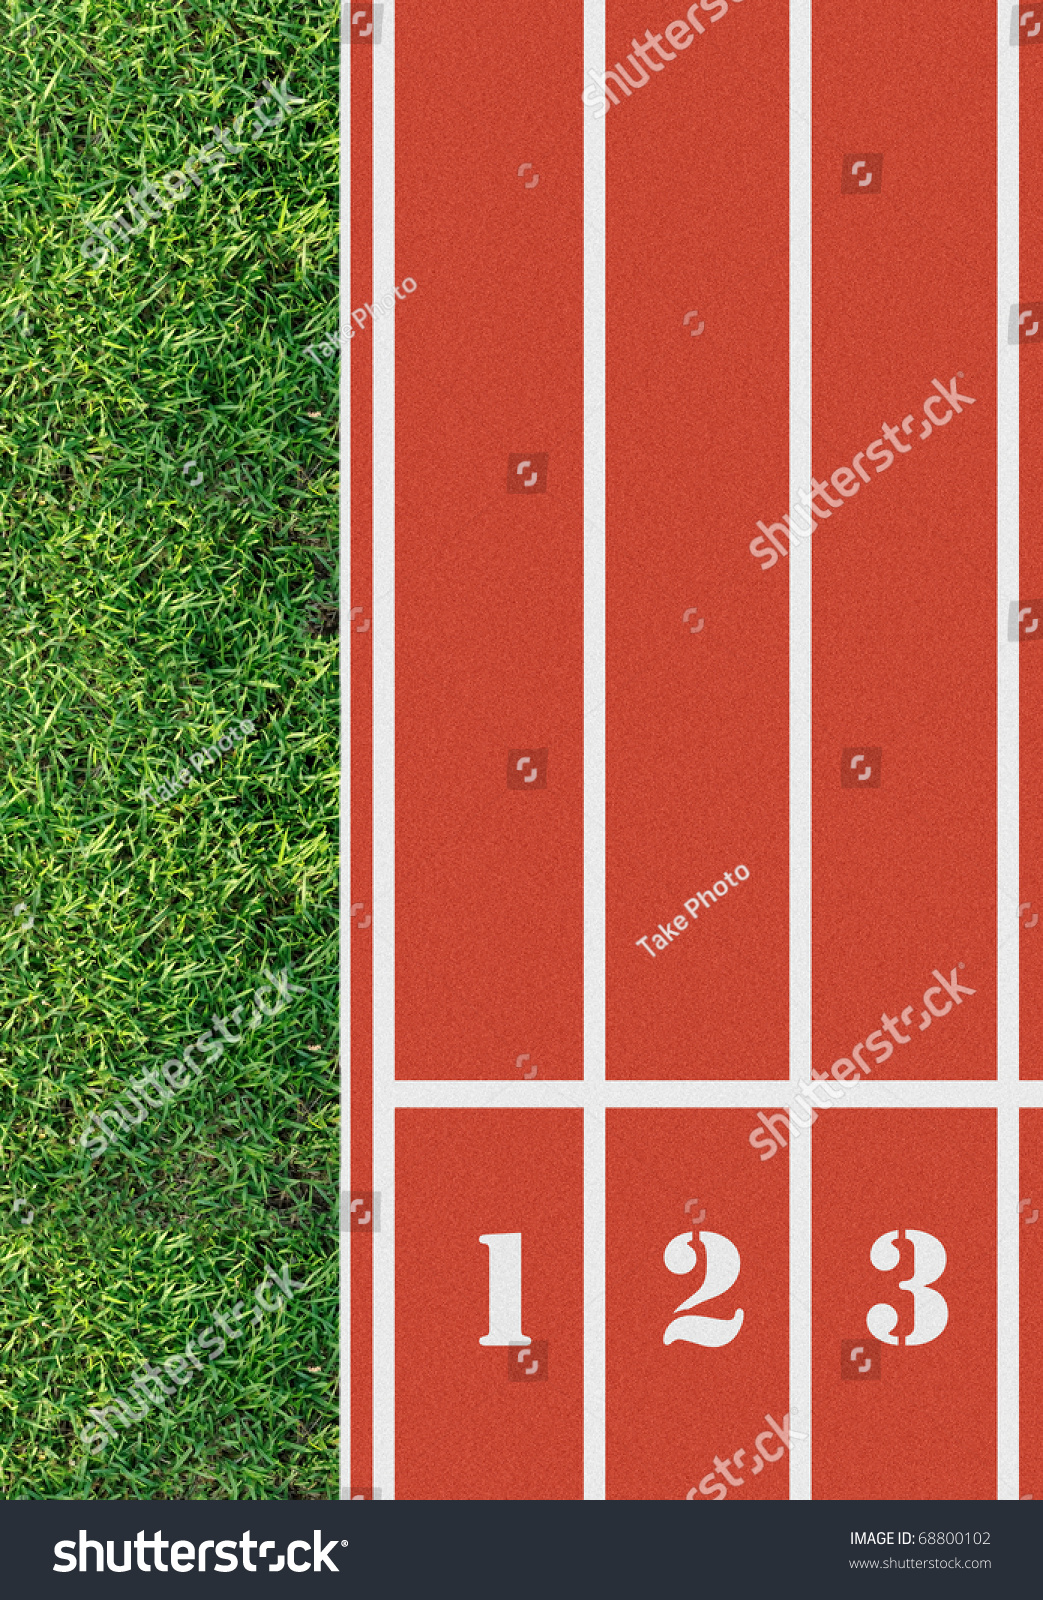 Number On Start Running Track Birds Stock Photo 68800102 ...  |Running Track Birds Eye View